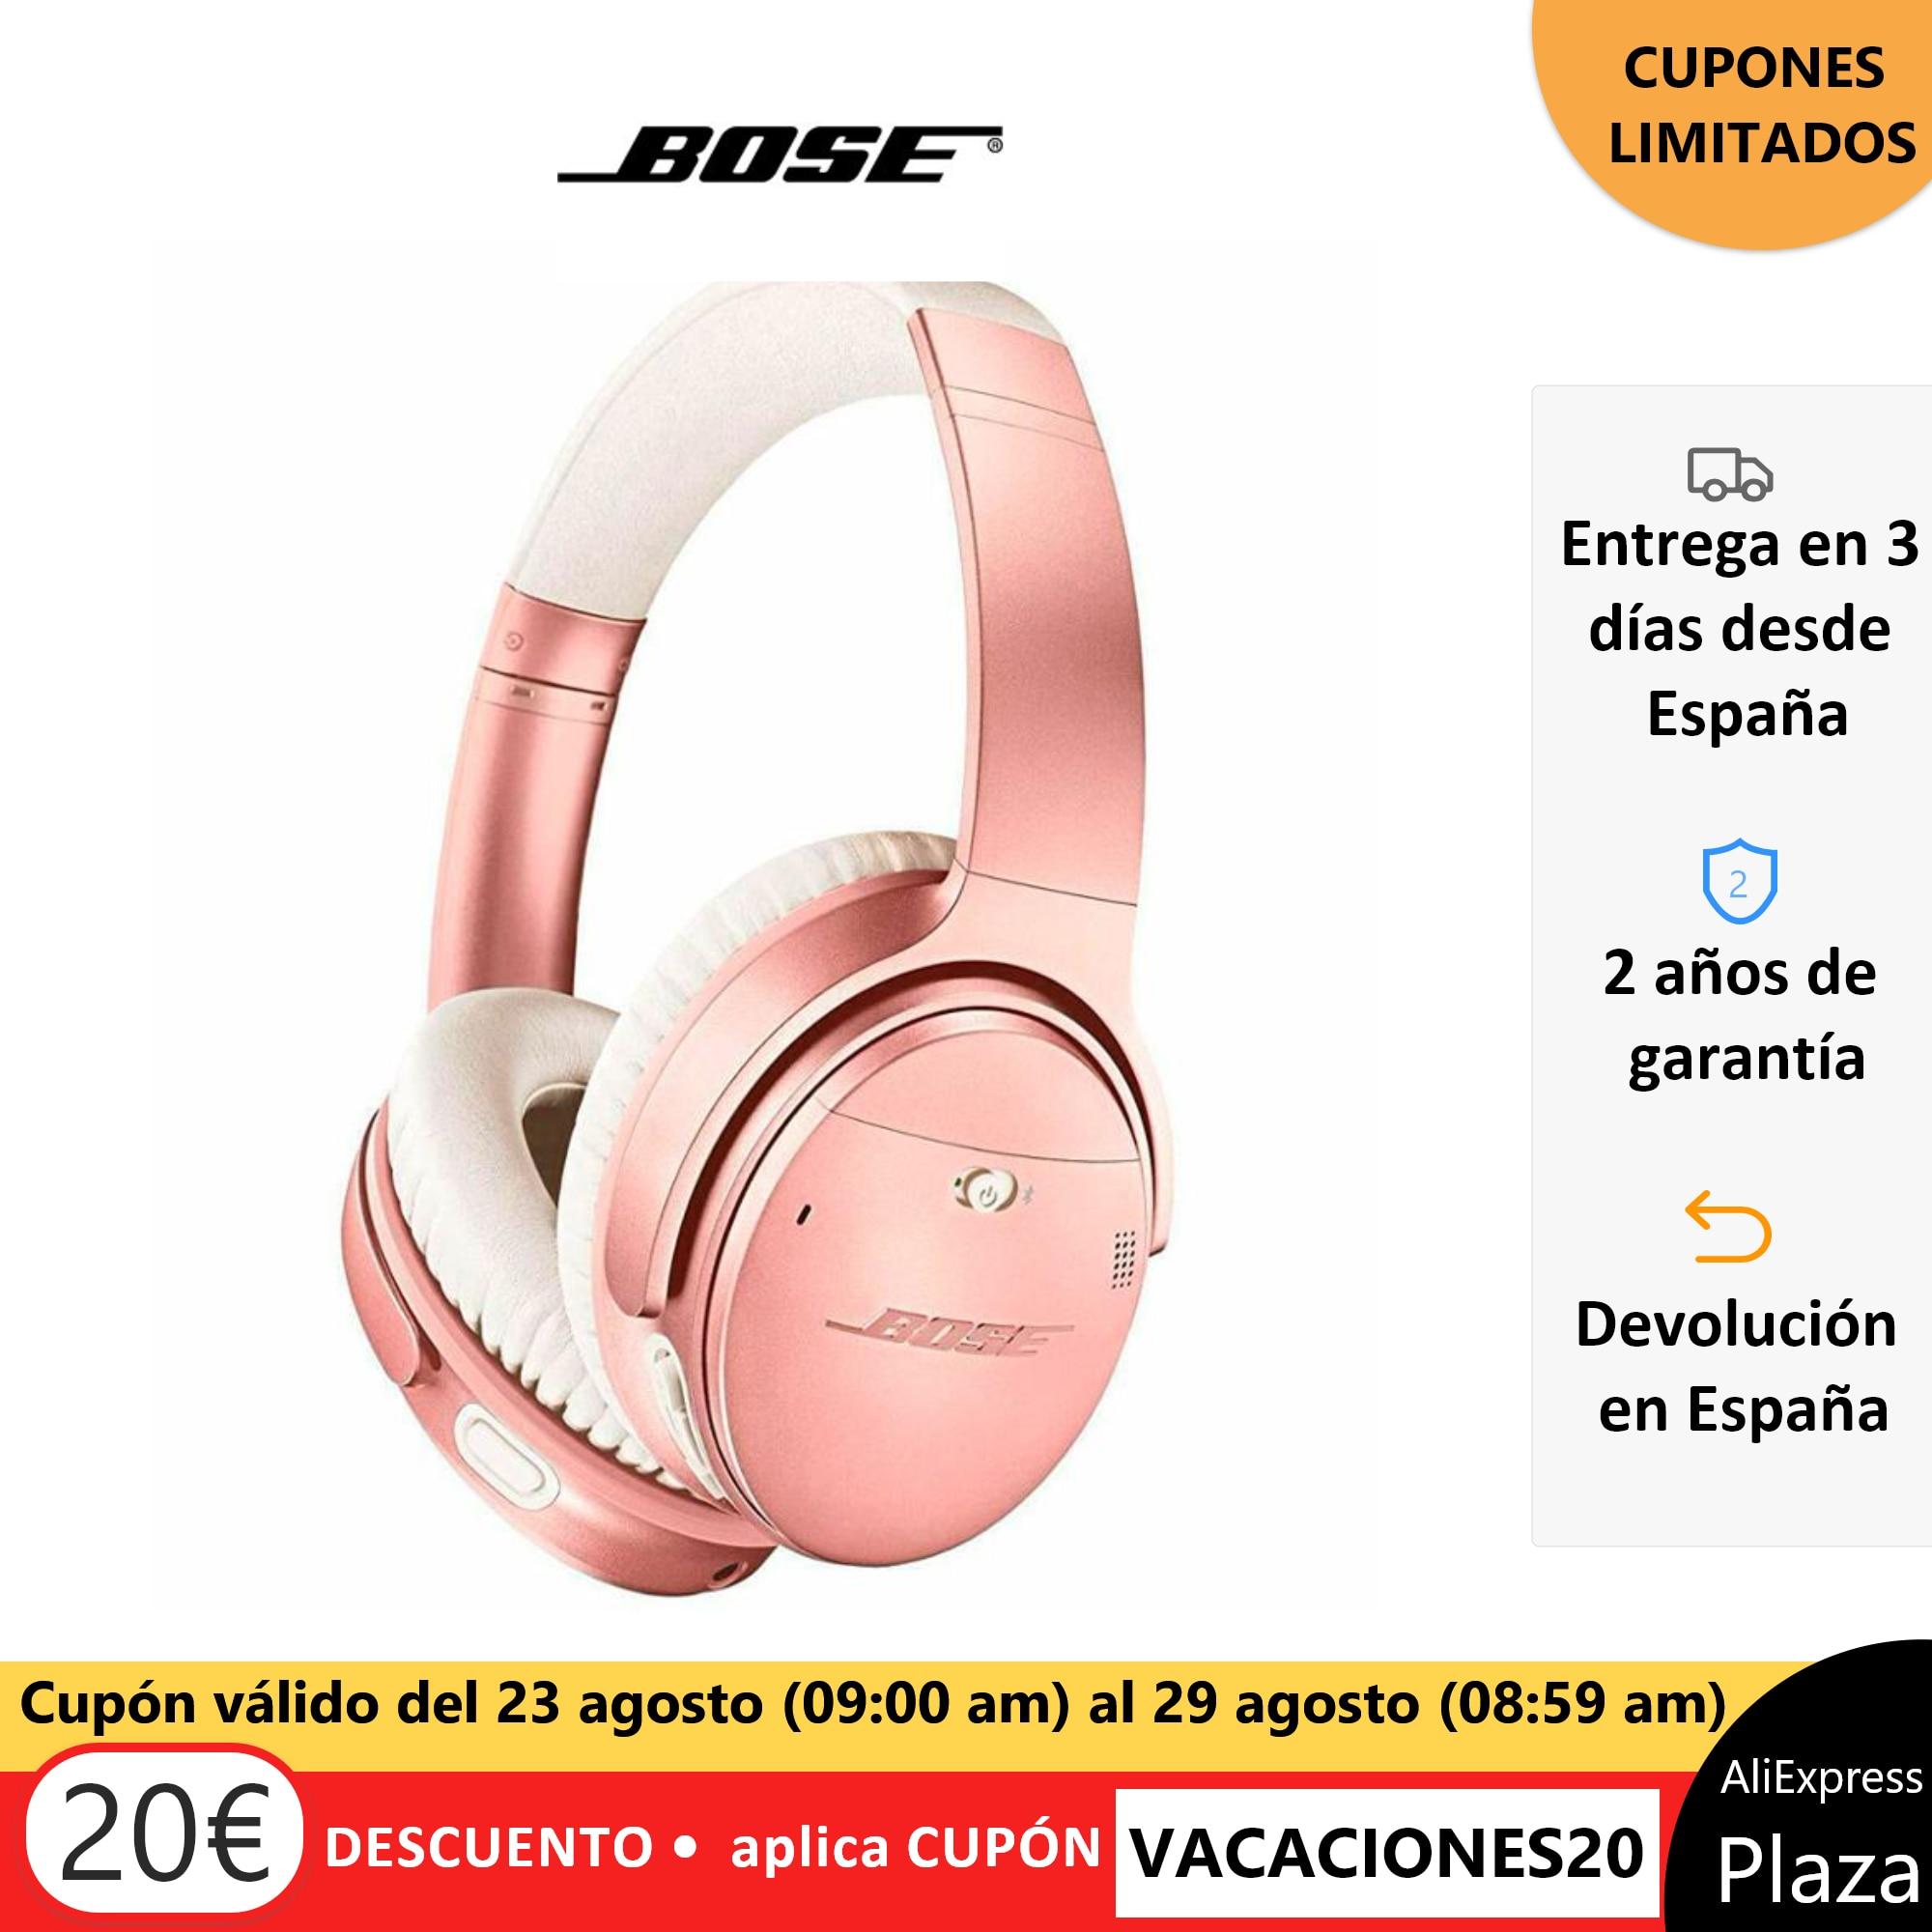 Bose QuietComfort 35 II wireless headphones ear bluetooth ratio noise canceling Google Assistant folding free from